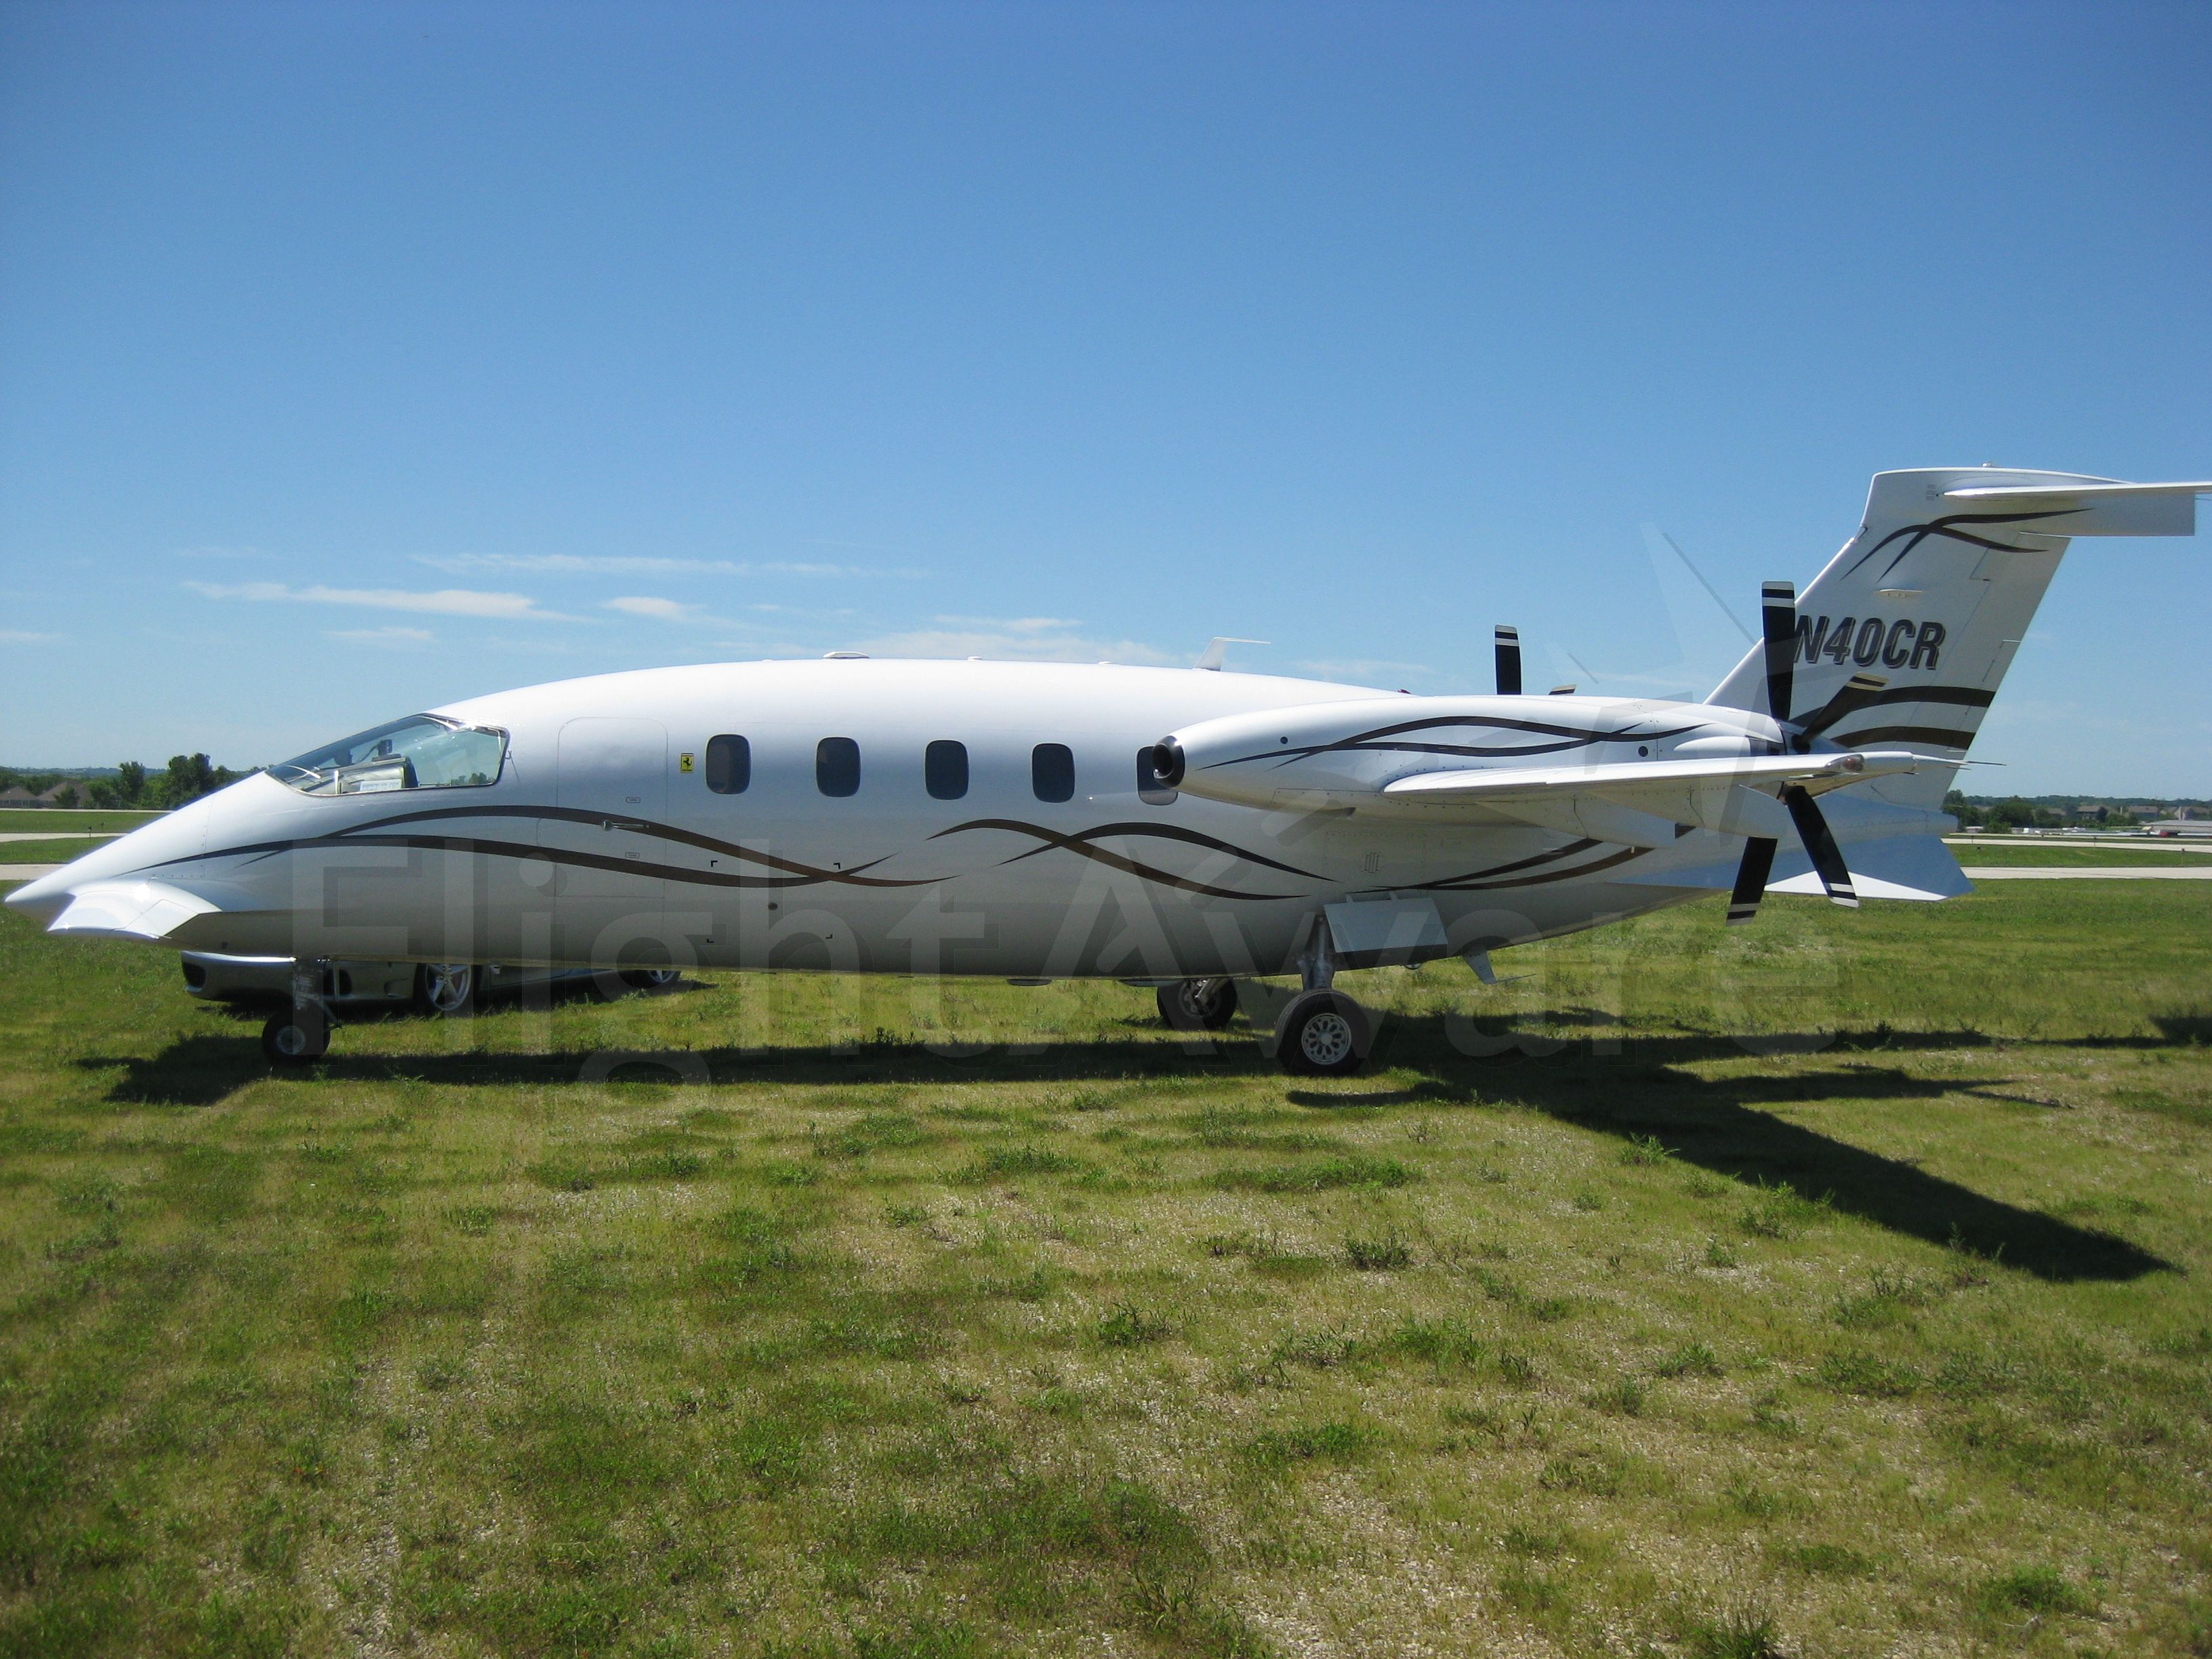 Piaggio P.180 Avanti (N677P) - This is one of the very few owner flown Piaggio Avantis in the U.S.